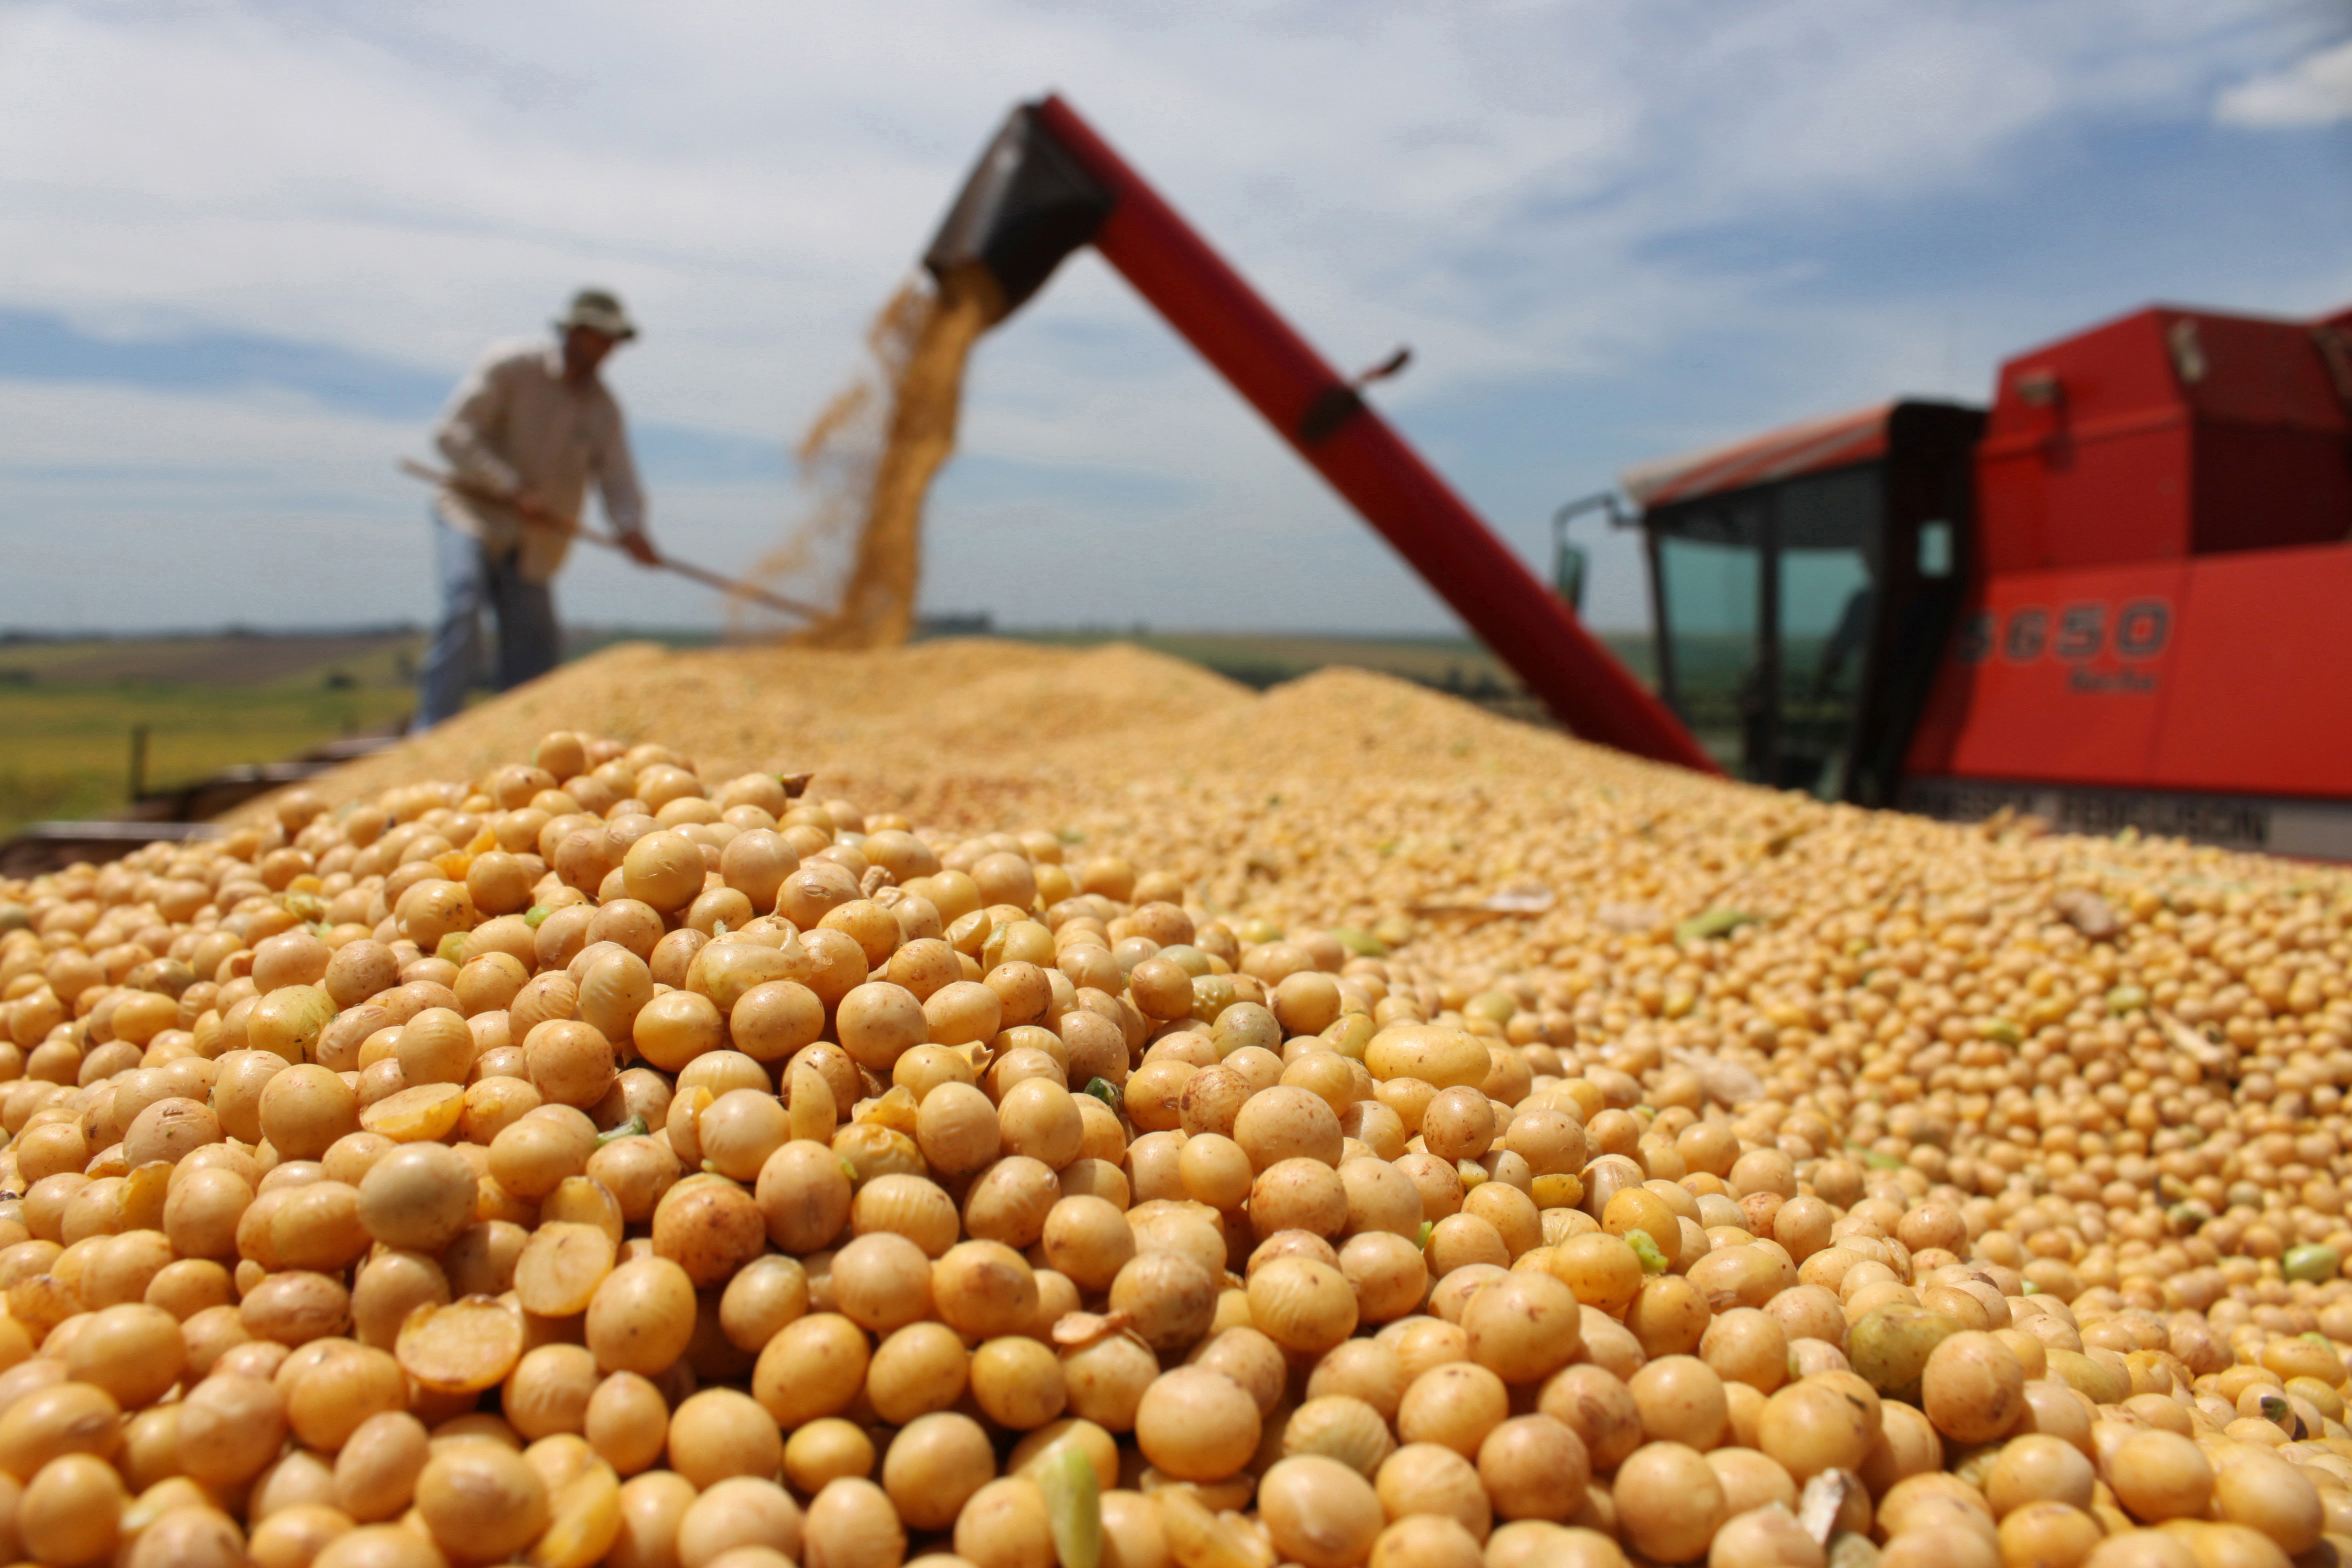 Máquina descarrega colheita de soja